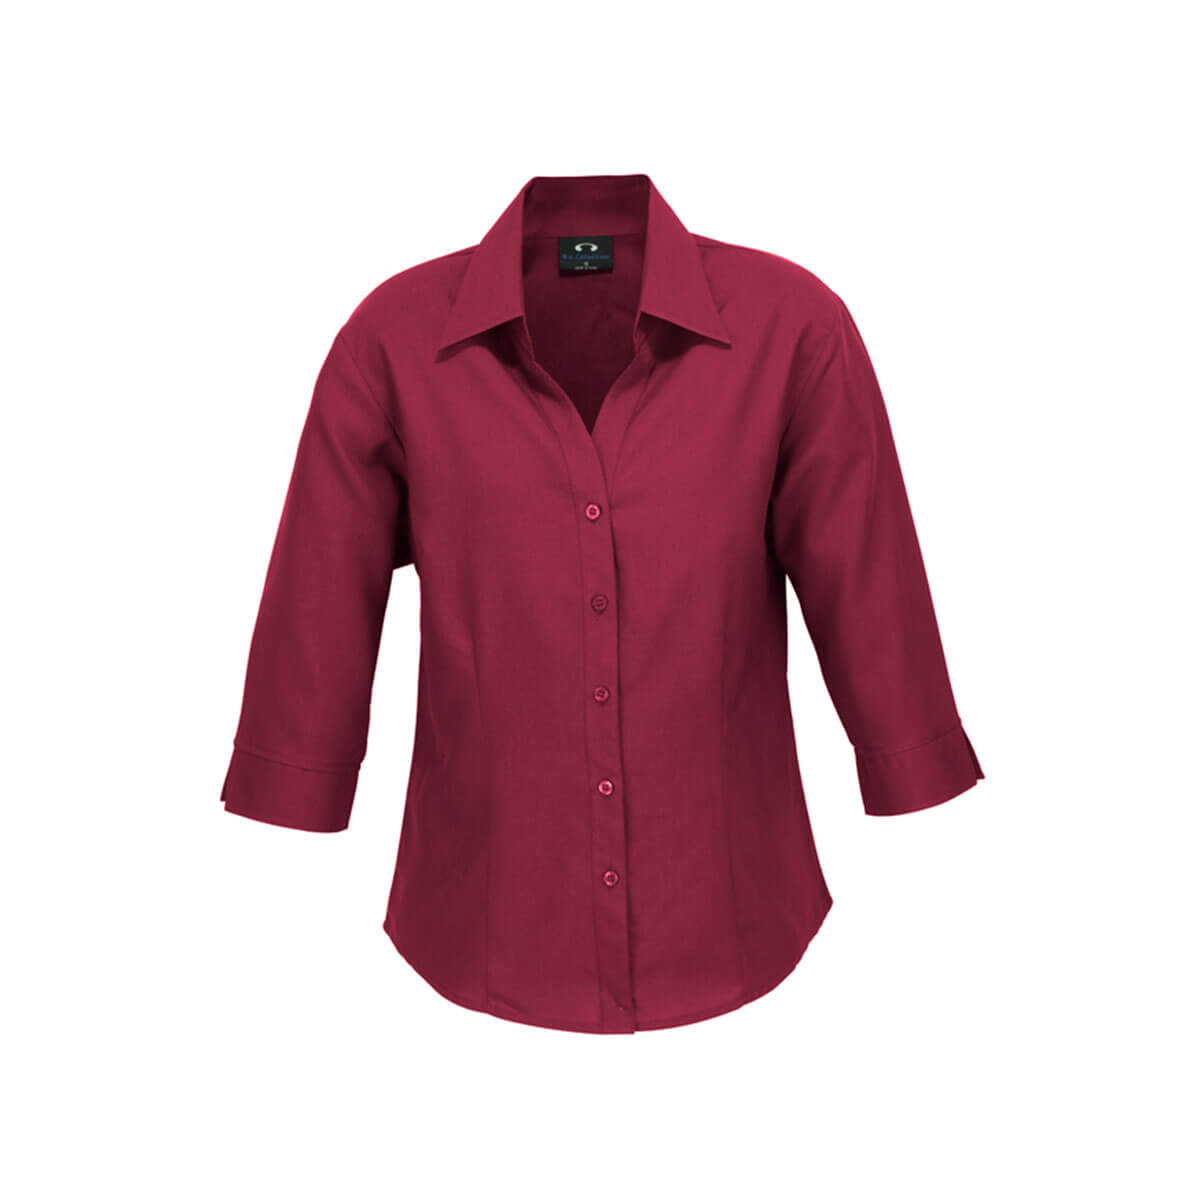 Ladies Plain Oasis 3/4 Sleeve Shirt-Cherry